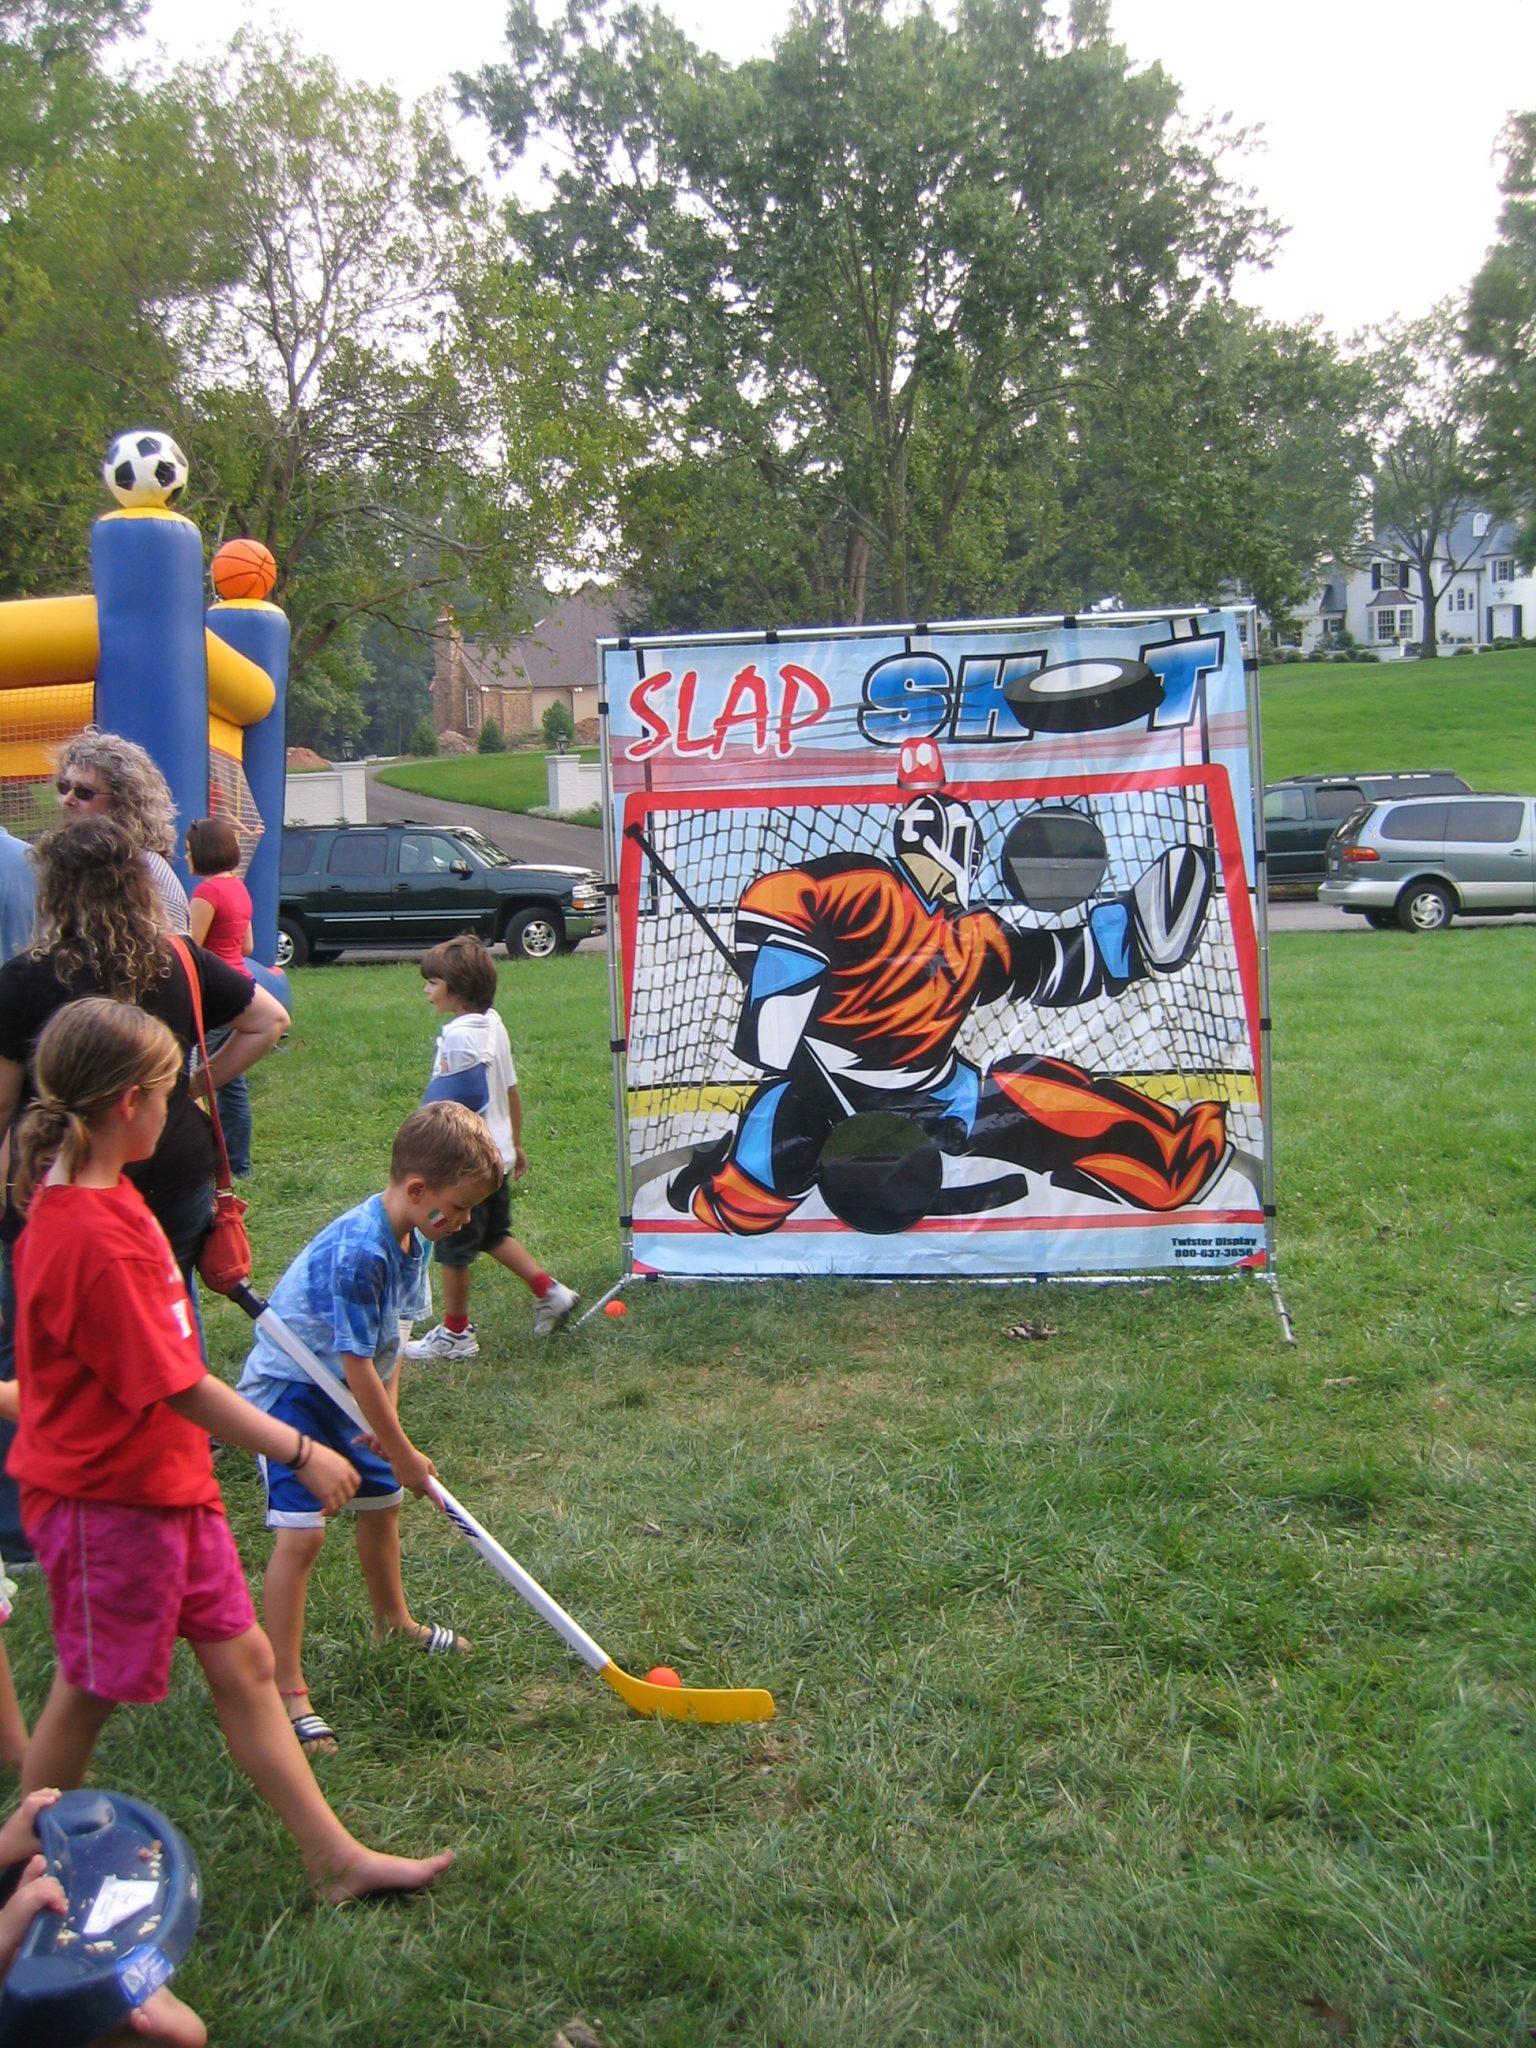 games hockey lawn carnival frame game slap shot adult golf baltimoresbest